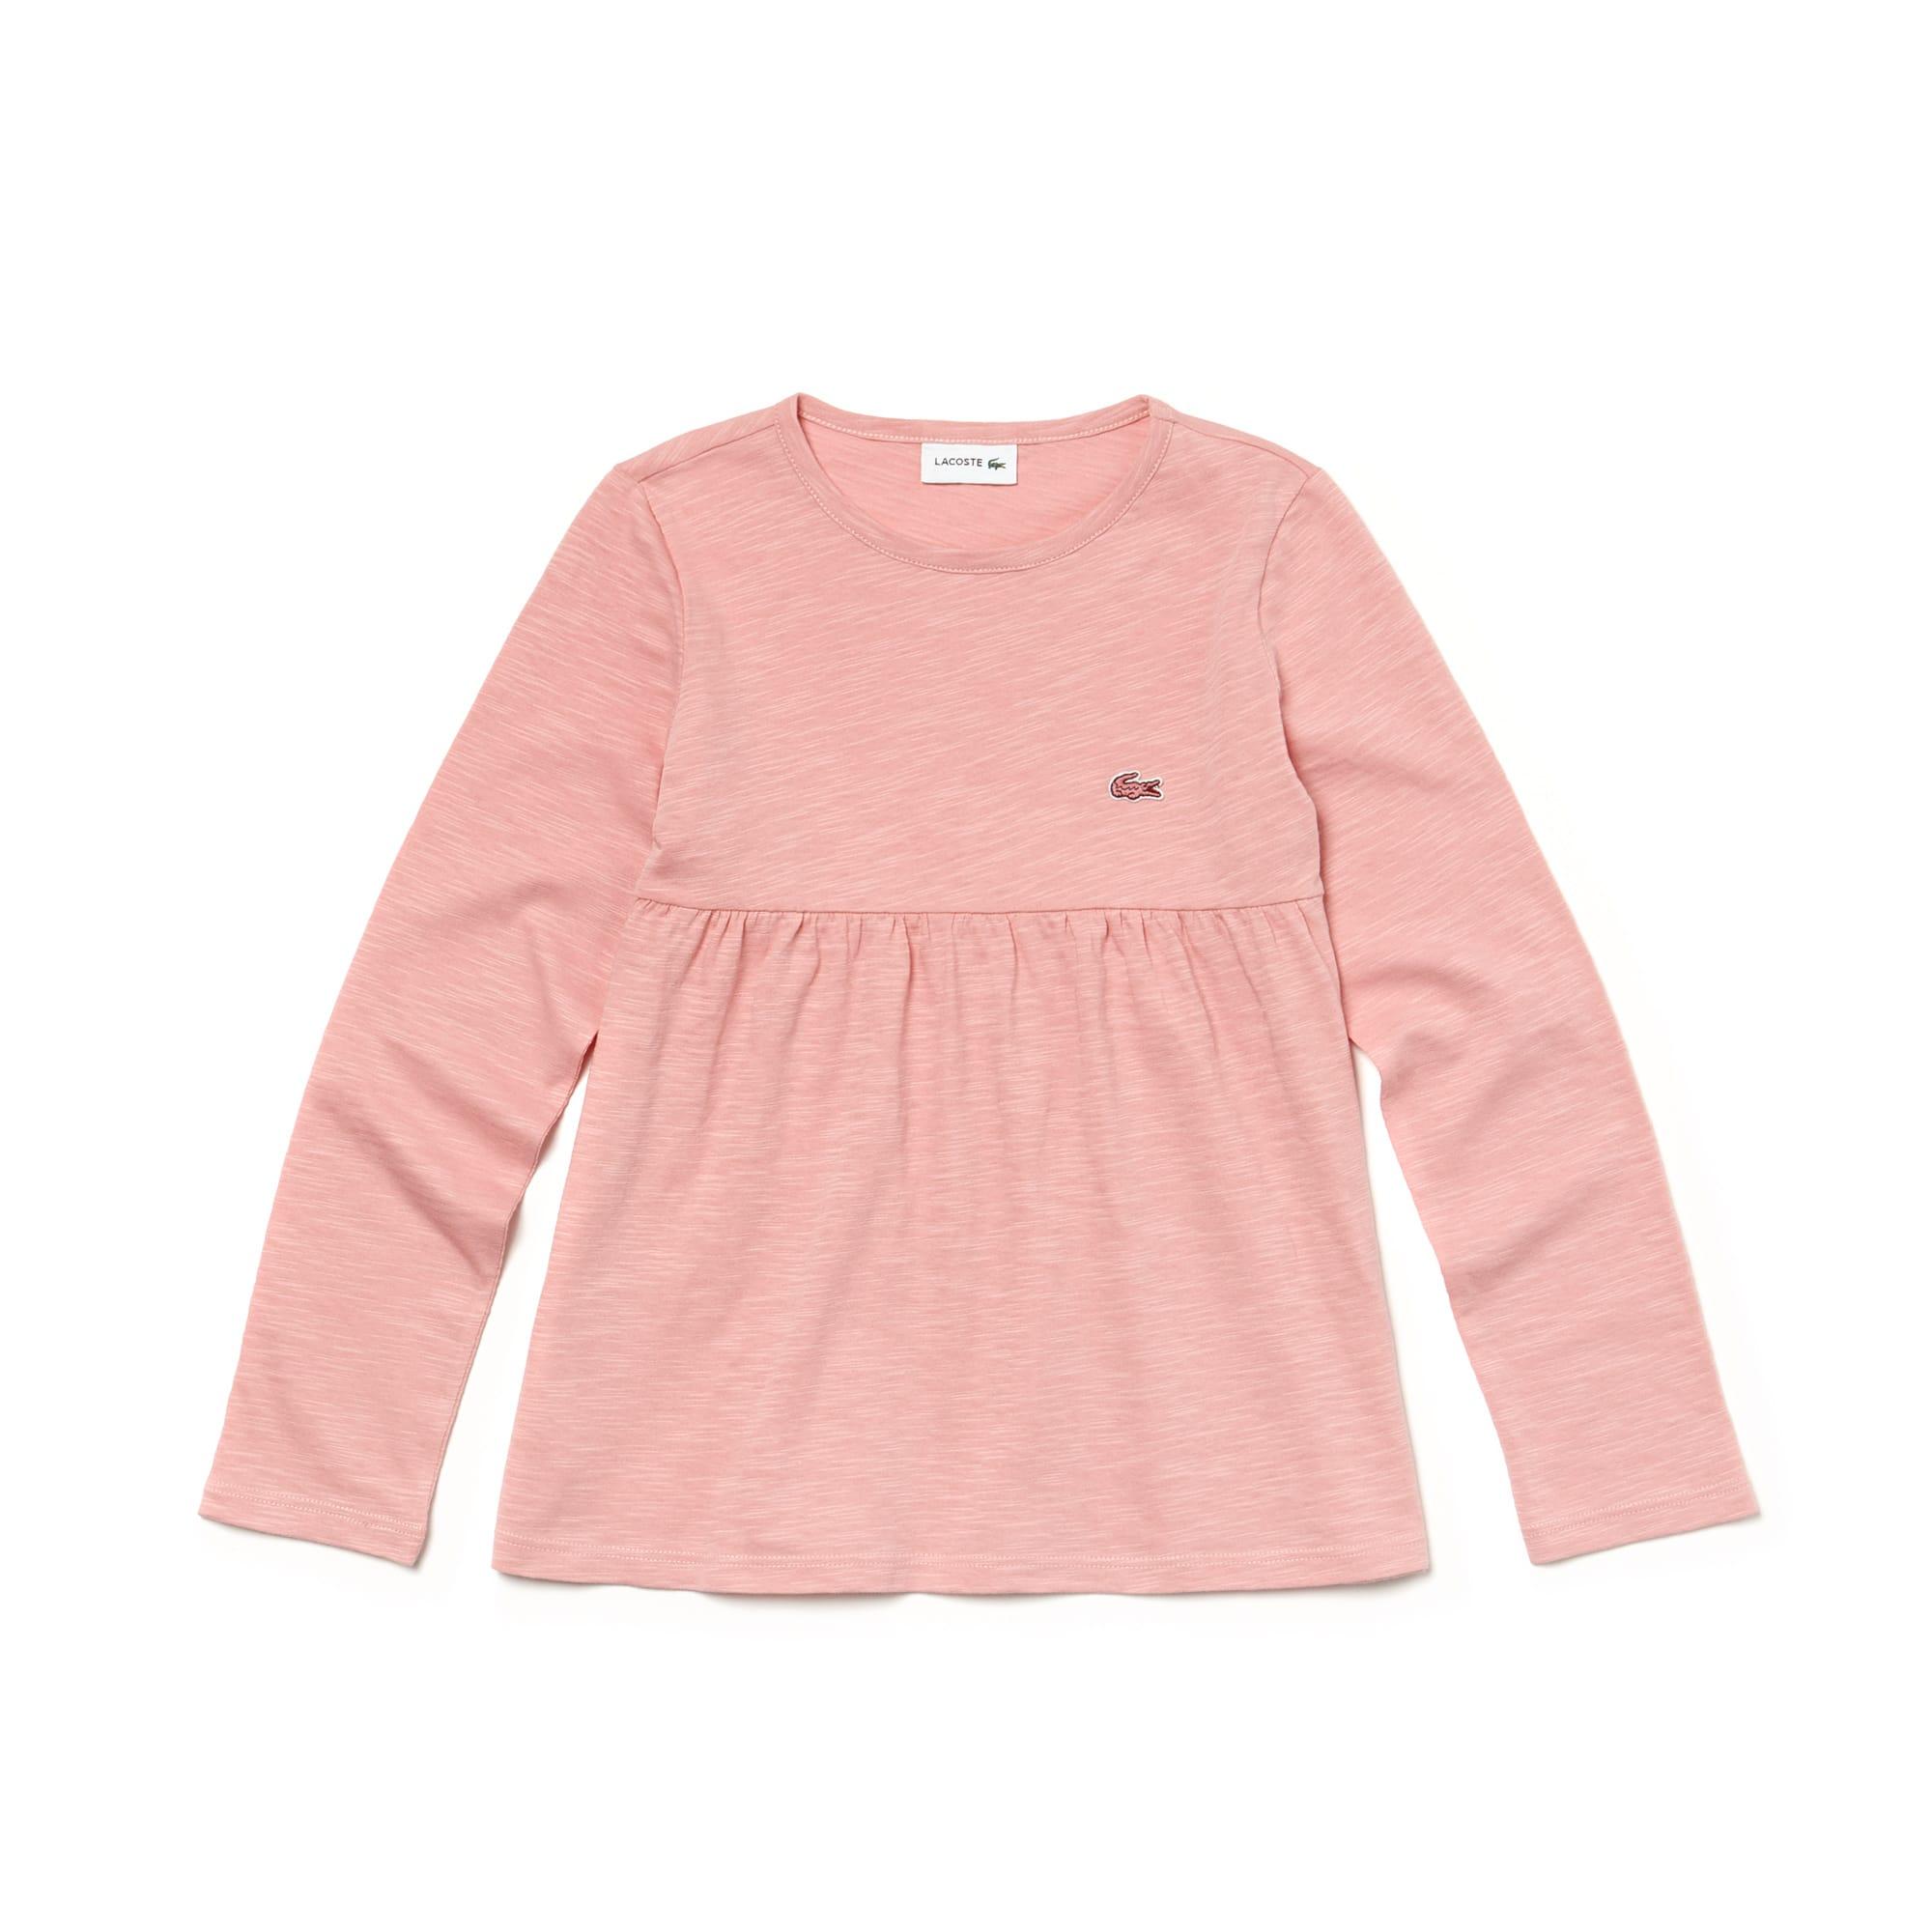 T-shirt da bambina a girocollo con maniche lunghe in jersey di cotone tinta unita